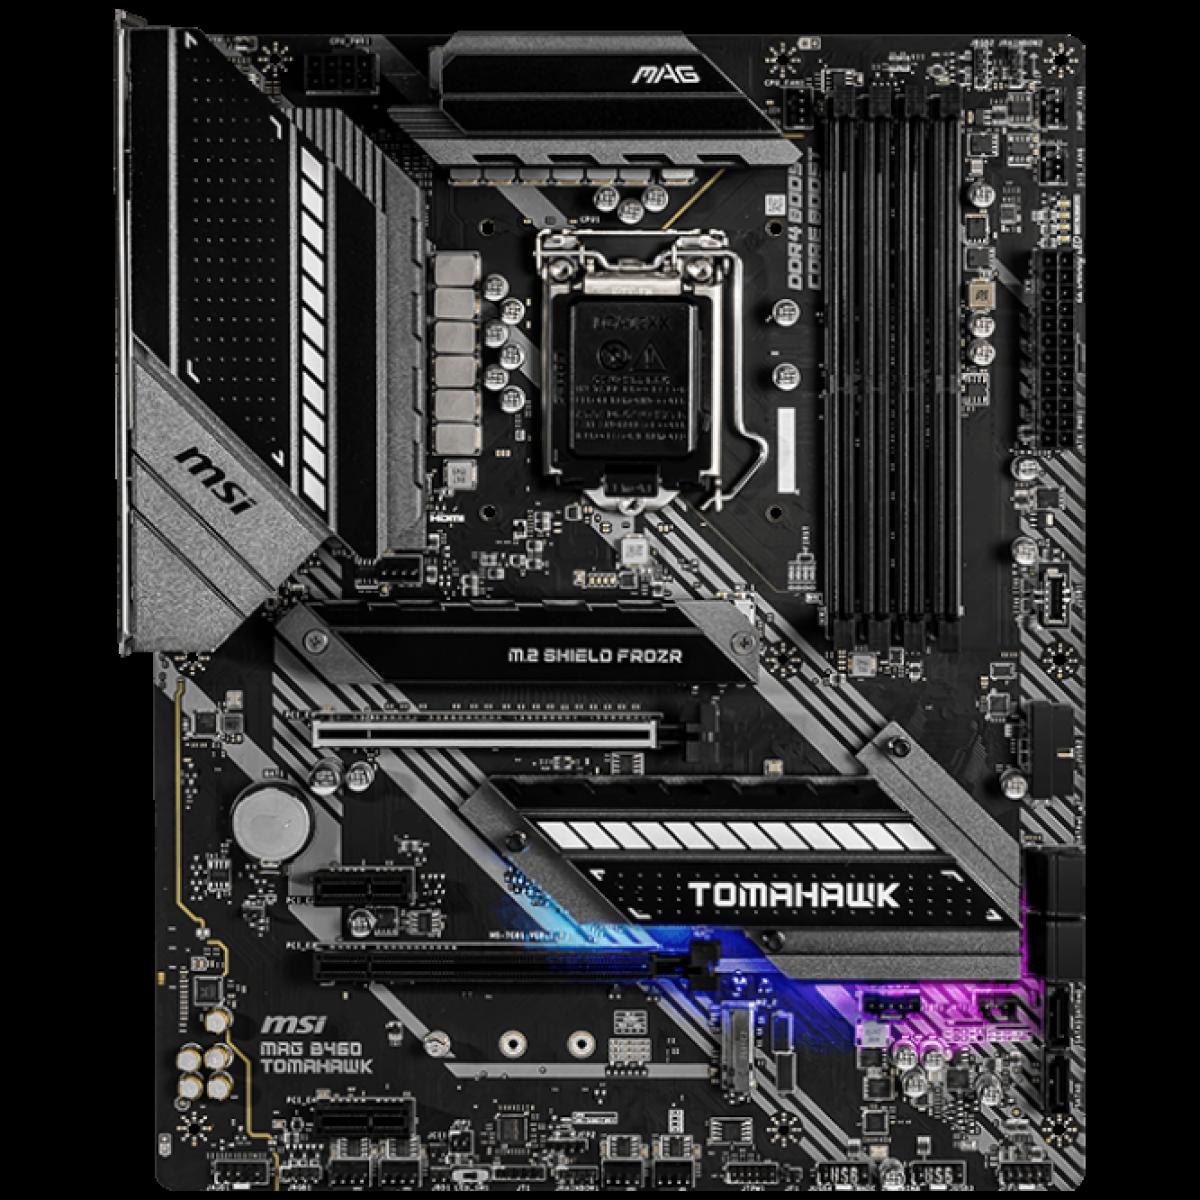 Placa Mãe MSI MAG B460 TOMAHAWK, Chipset B460, INTEL LGA 1200, ATX, DDR4, 911-7C81-006